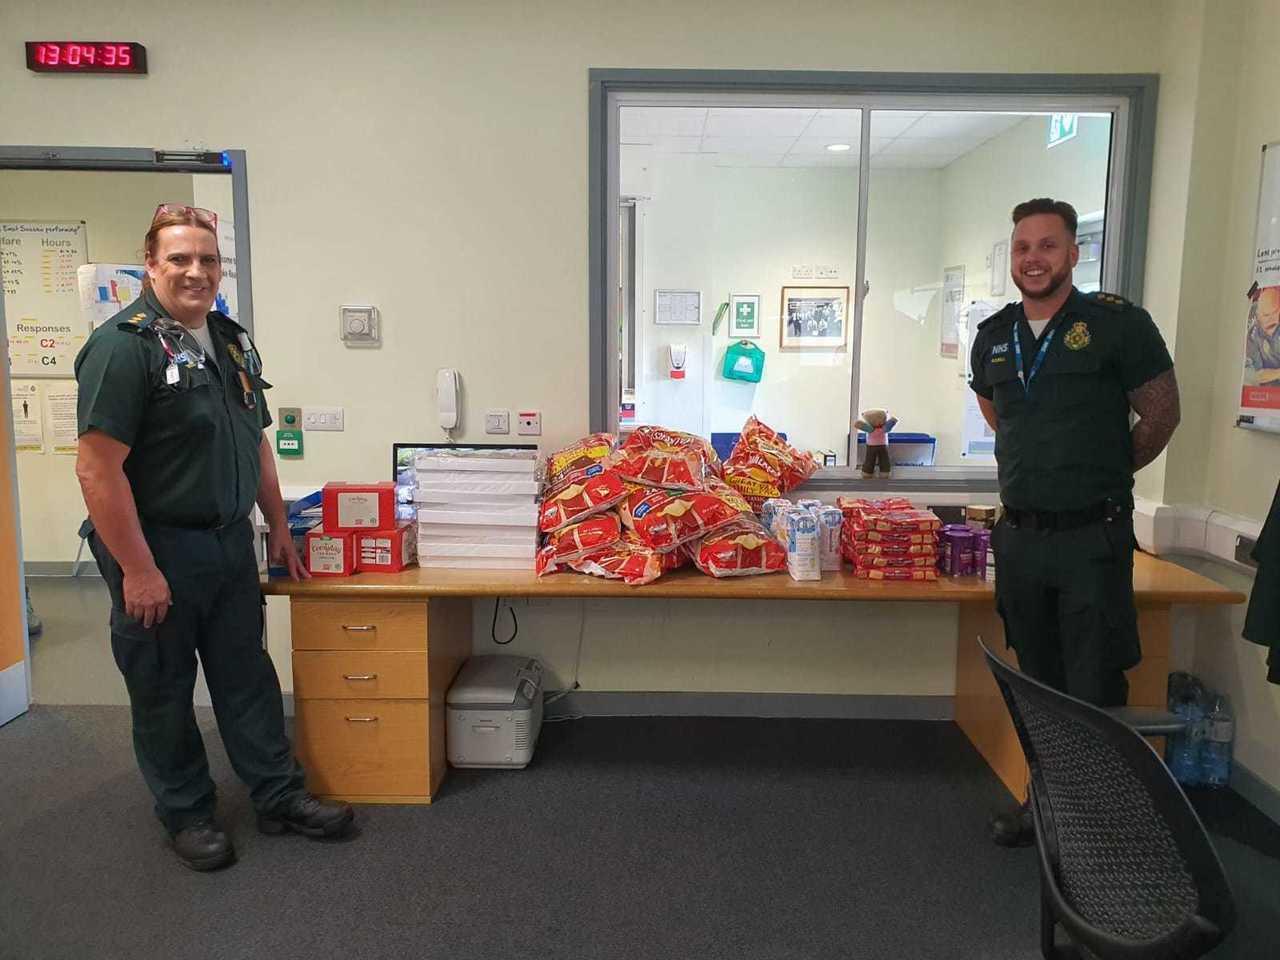 Proud of ambulance team | Asda Eastbourne